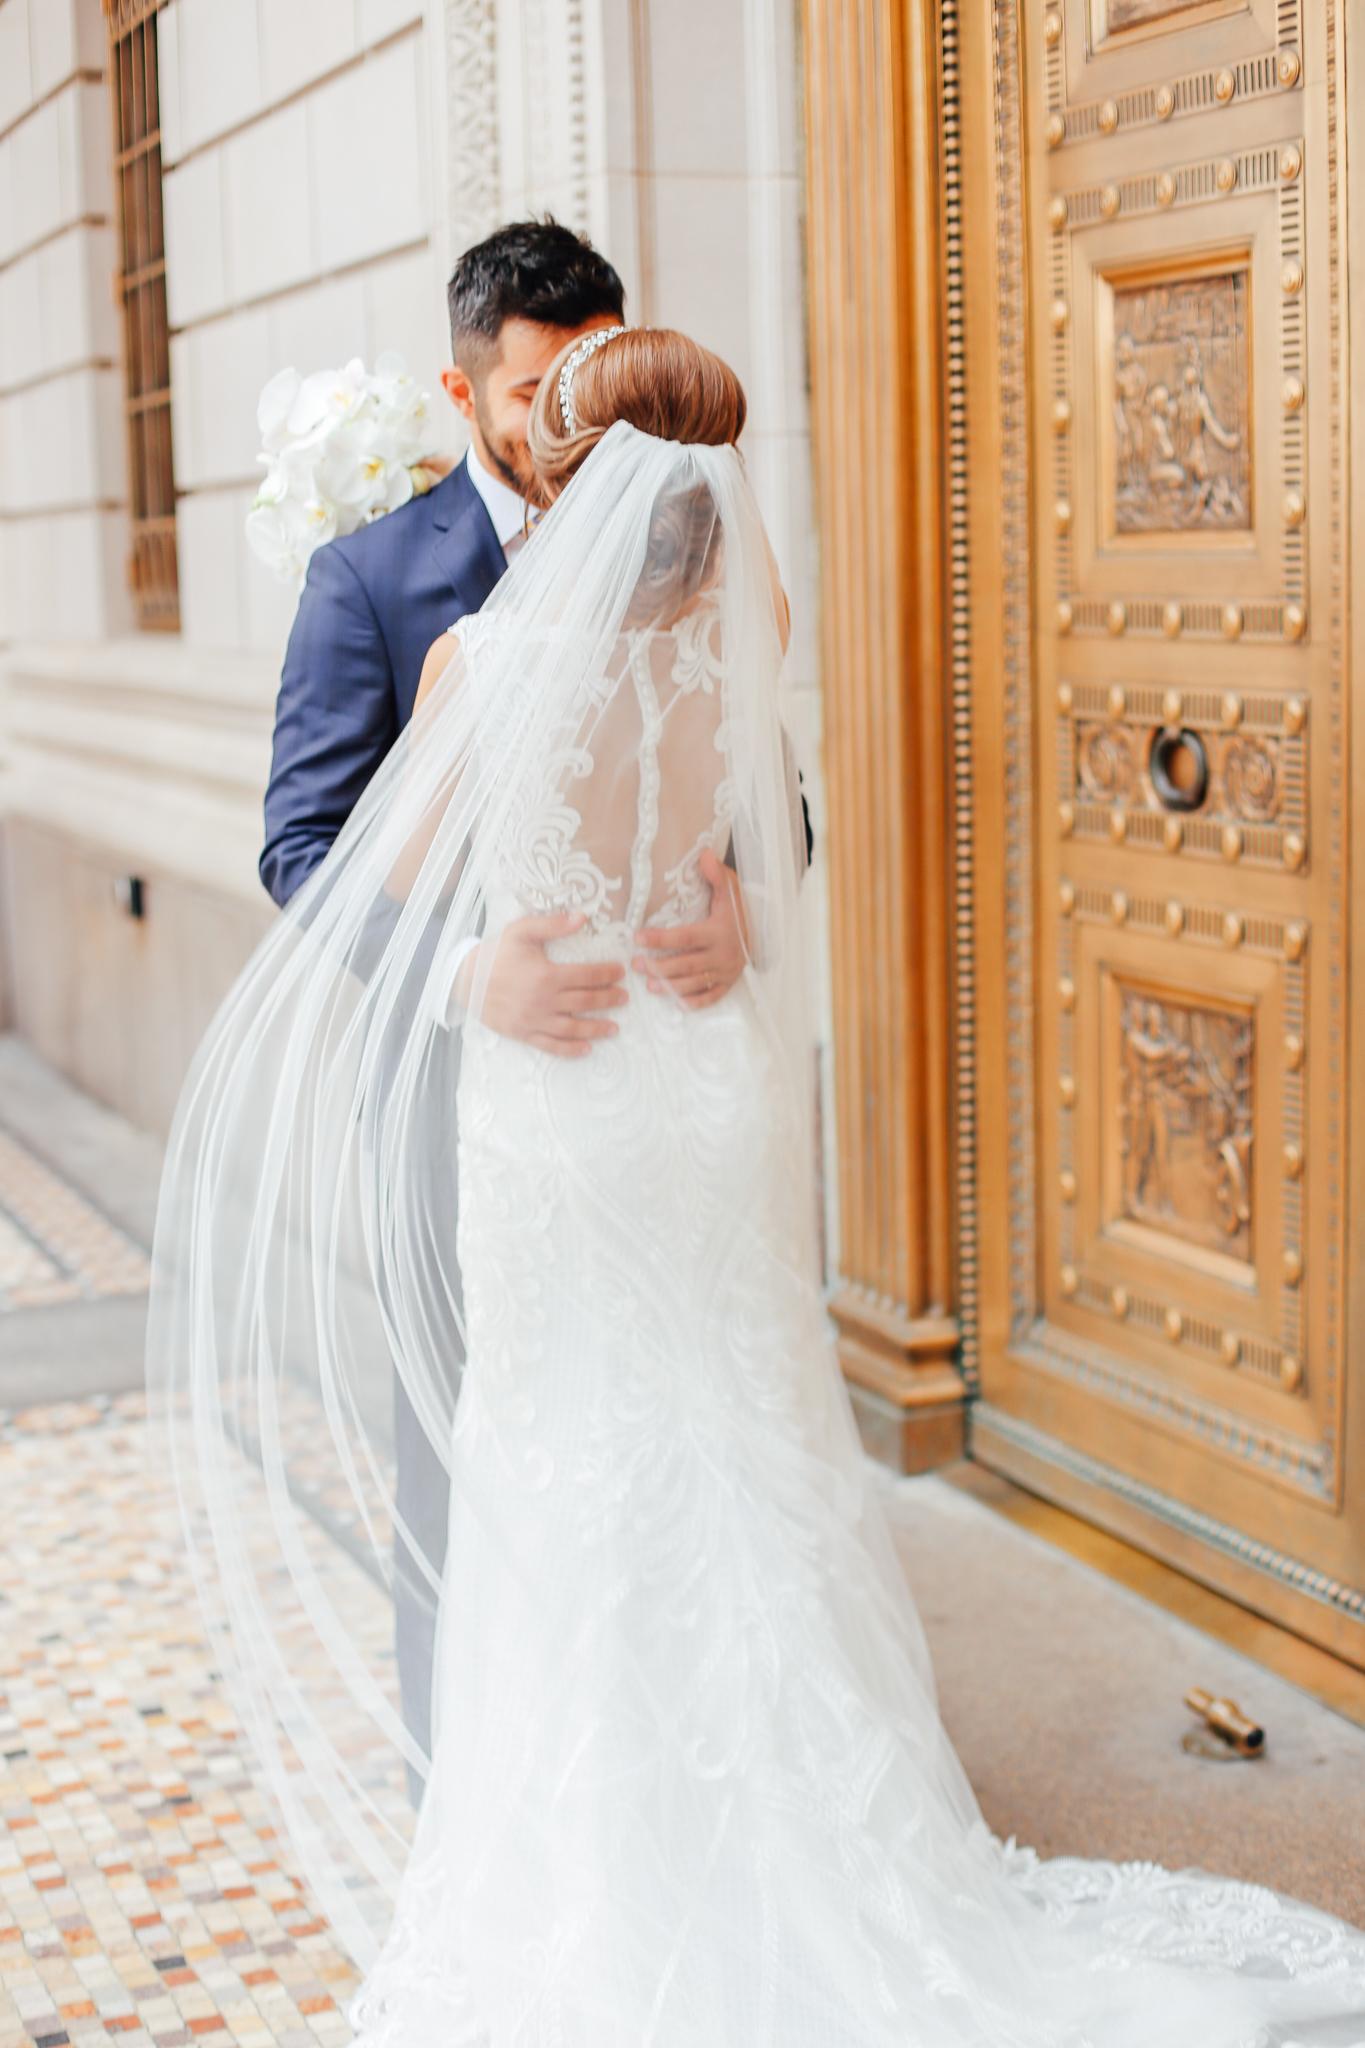 Judy and Theo - Portland Wedding Photographer - 29.jpg